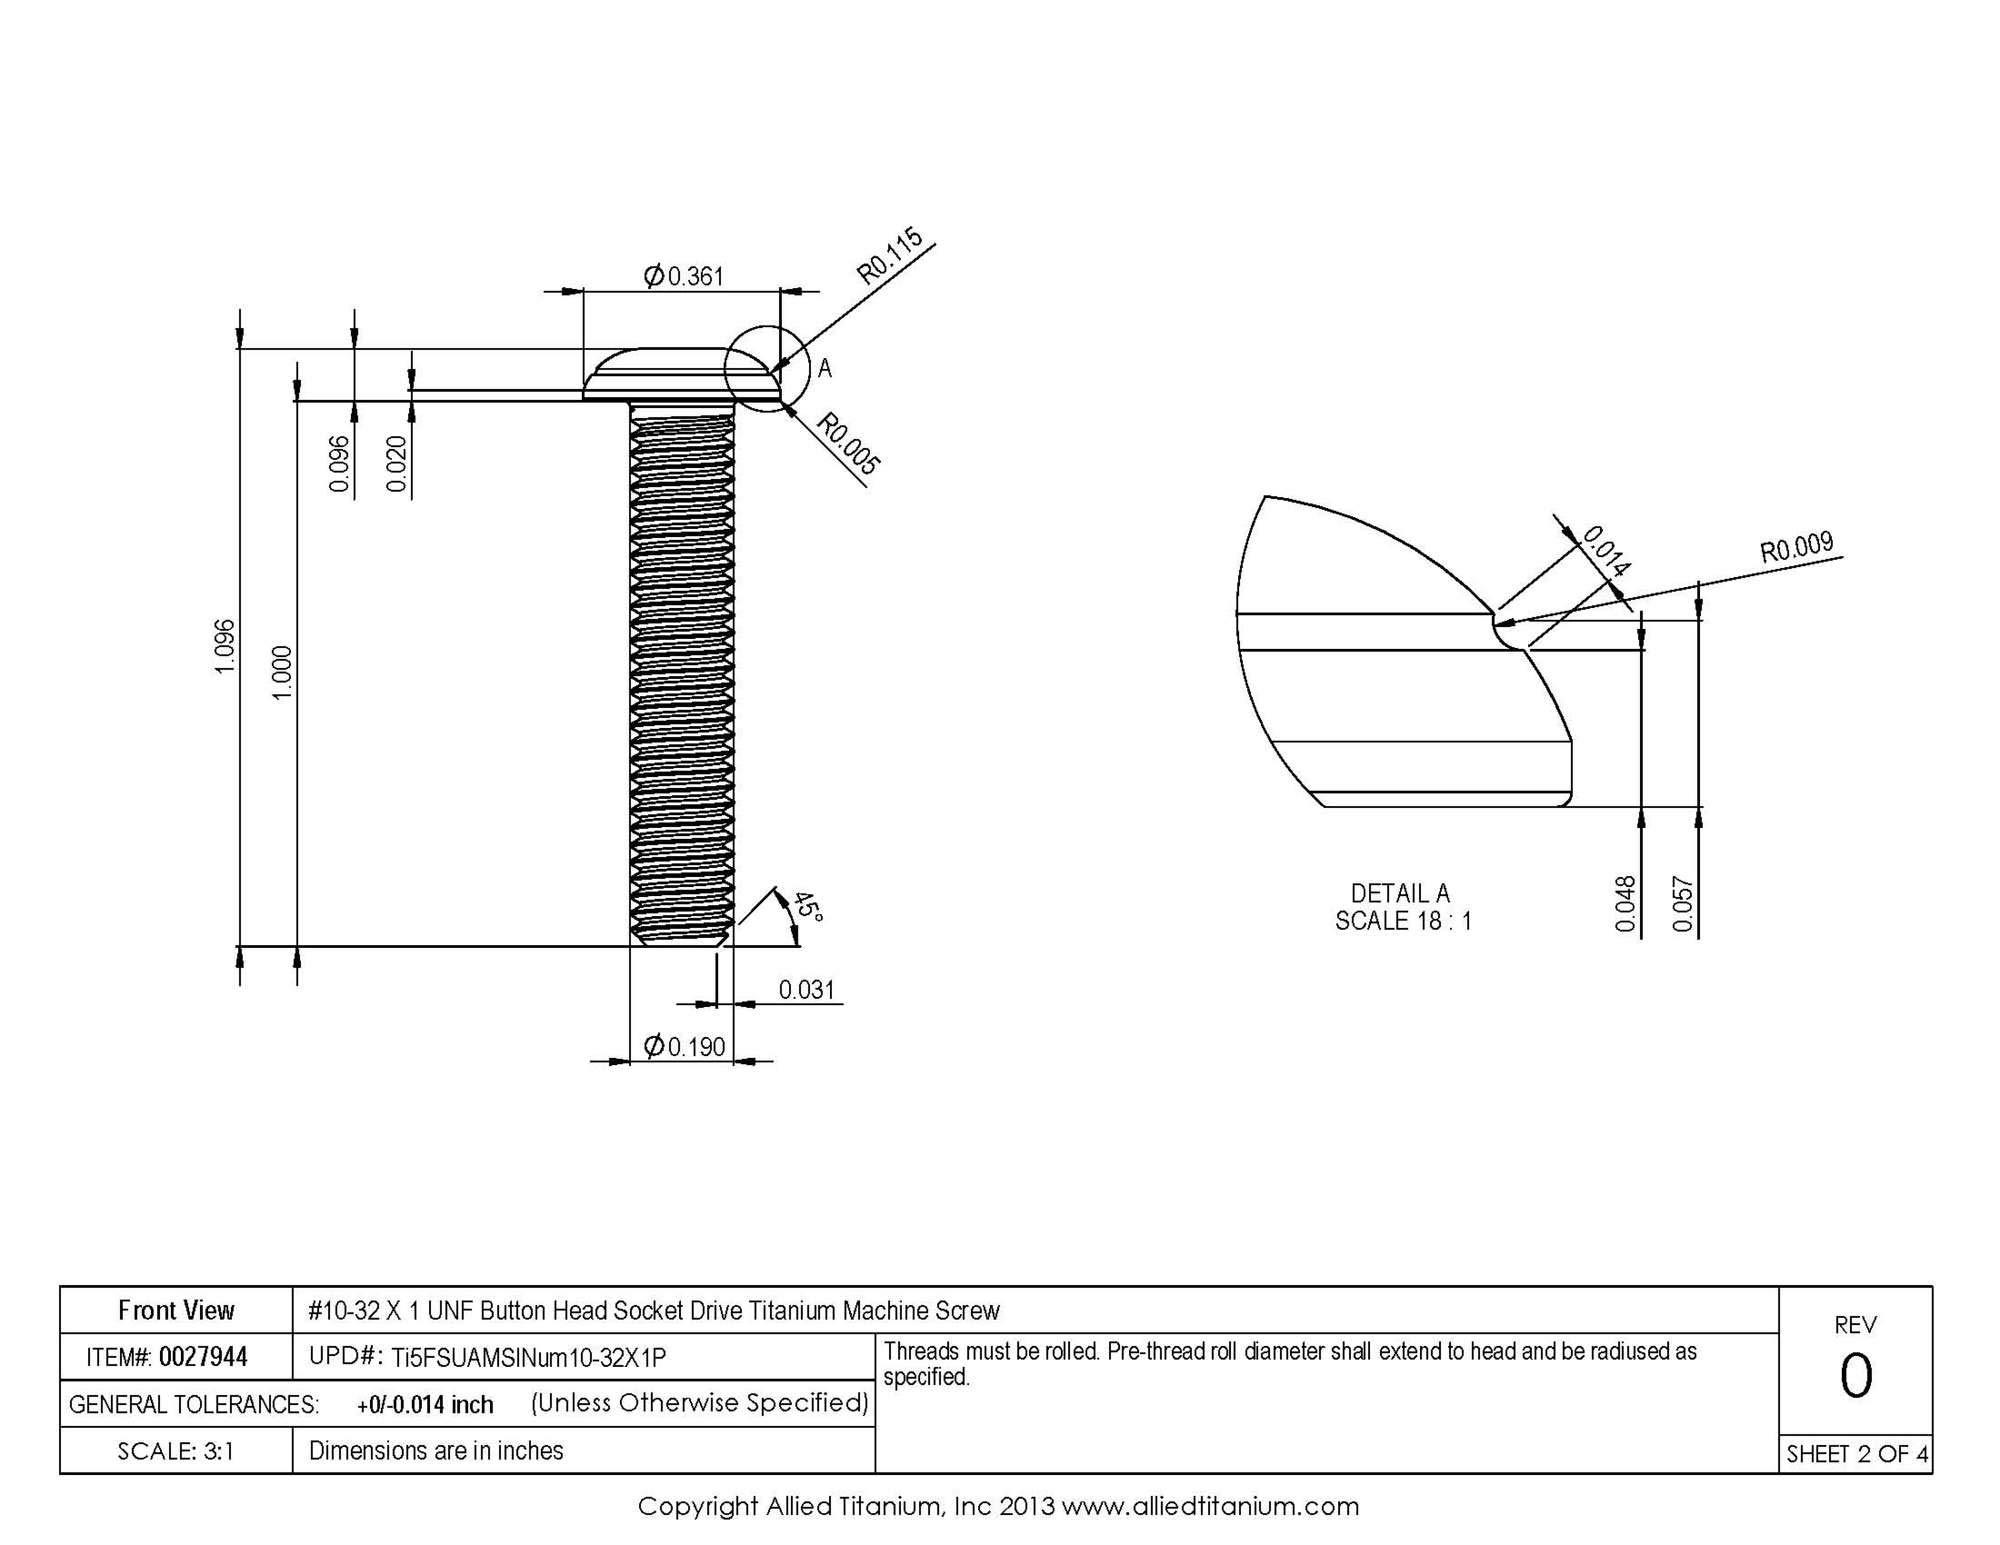 Allied Titanium 0027944, (Pack of 10) #10-32 X 1 UNF Button Head Socket Drive Machine Screw, Grade 5 (Ti-6Al-4V) by Allied Titanium (Image #3)